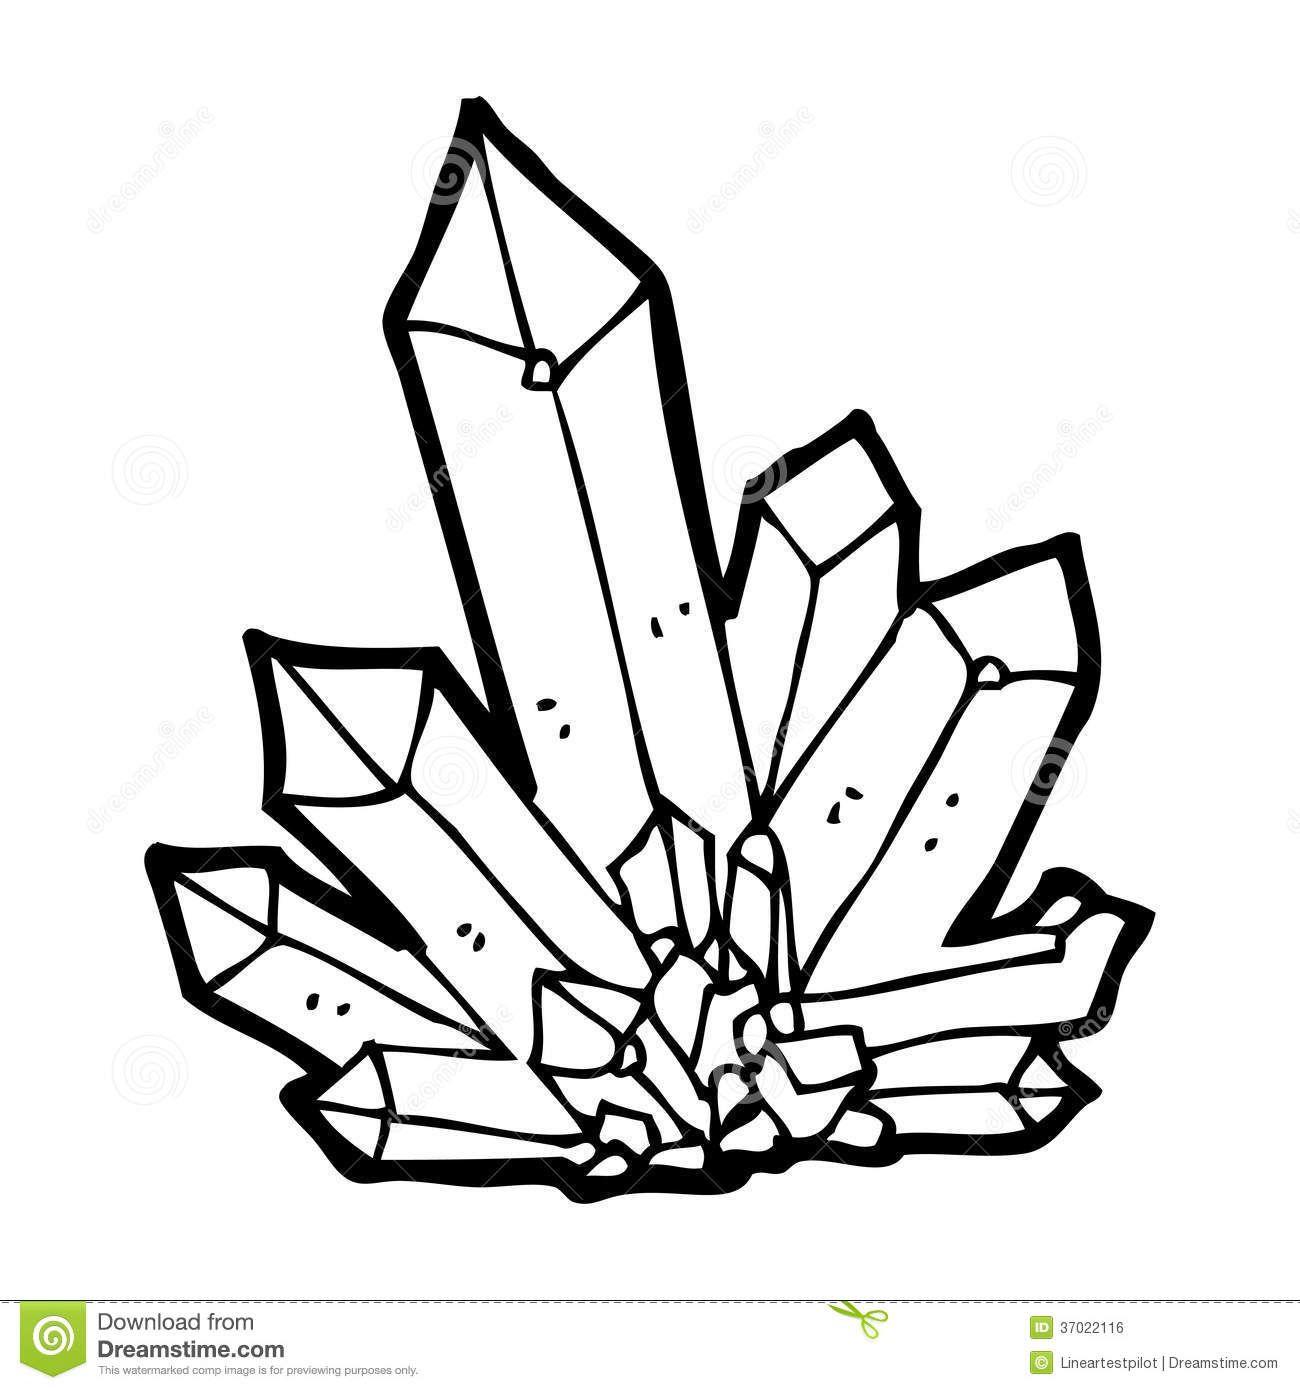 Pix For Gt Quartz Crystal Drawing